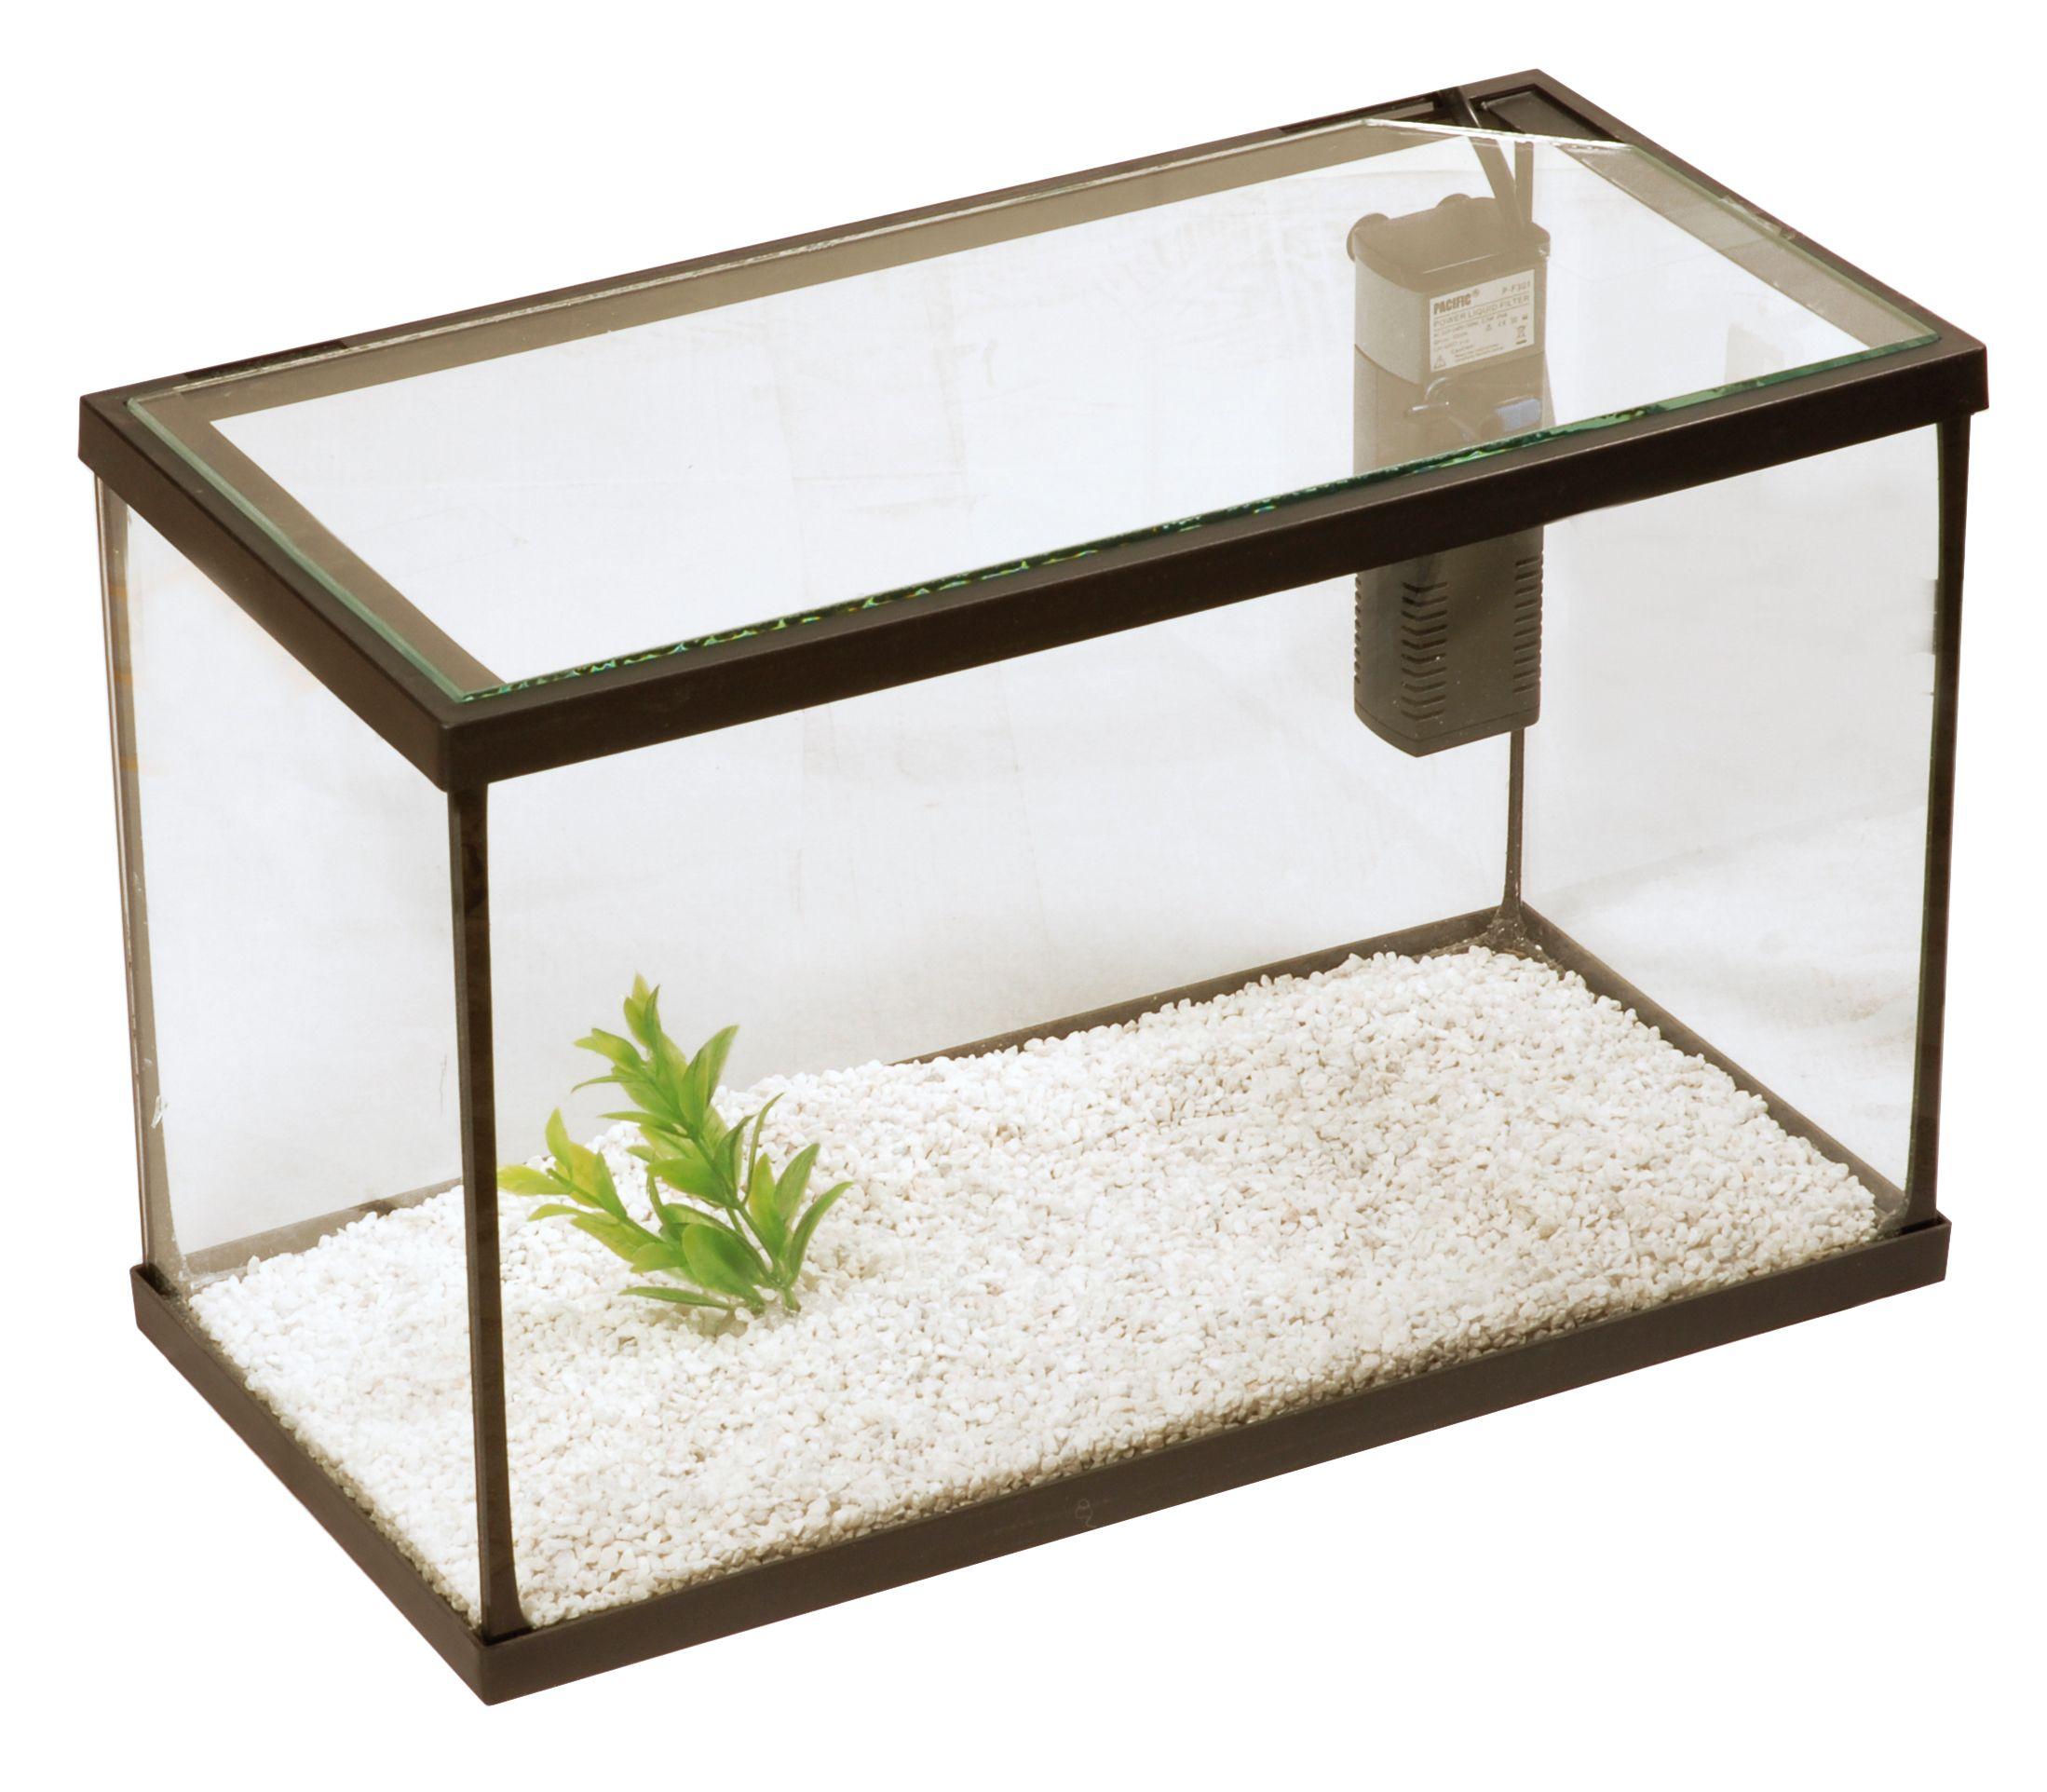 62032bc6082130f8a7a1160815fda5e0 Frais De Aquarium A tortue Concept